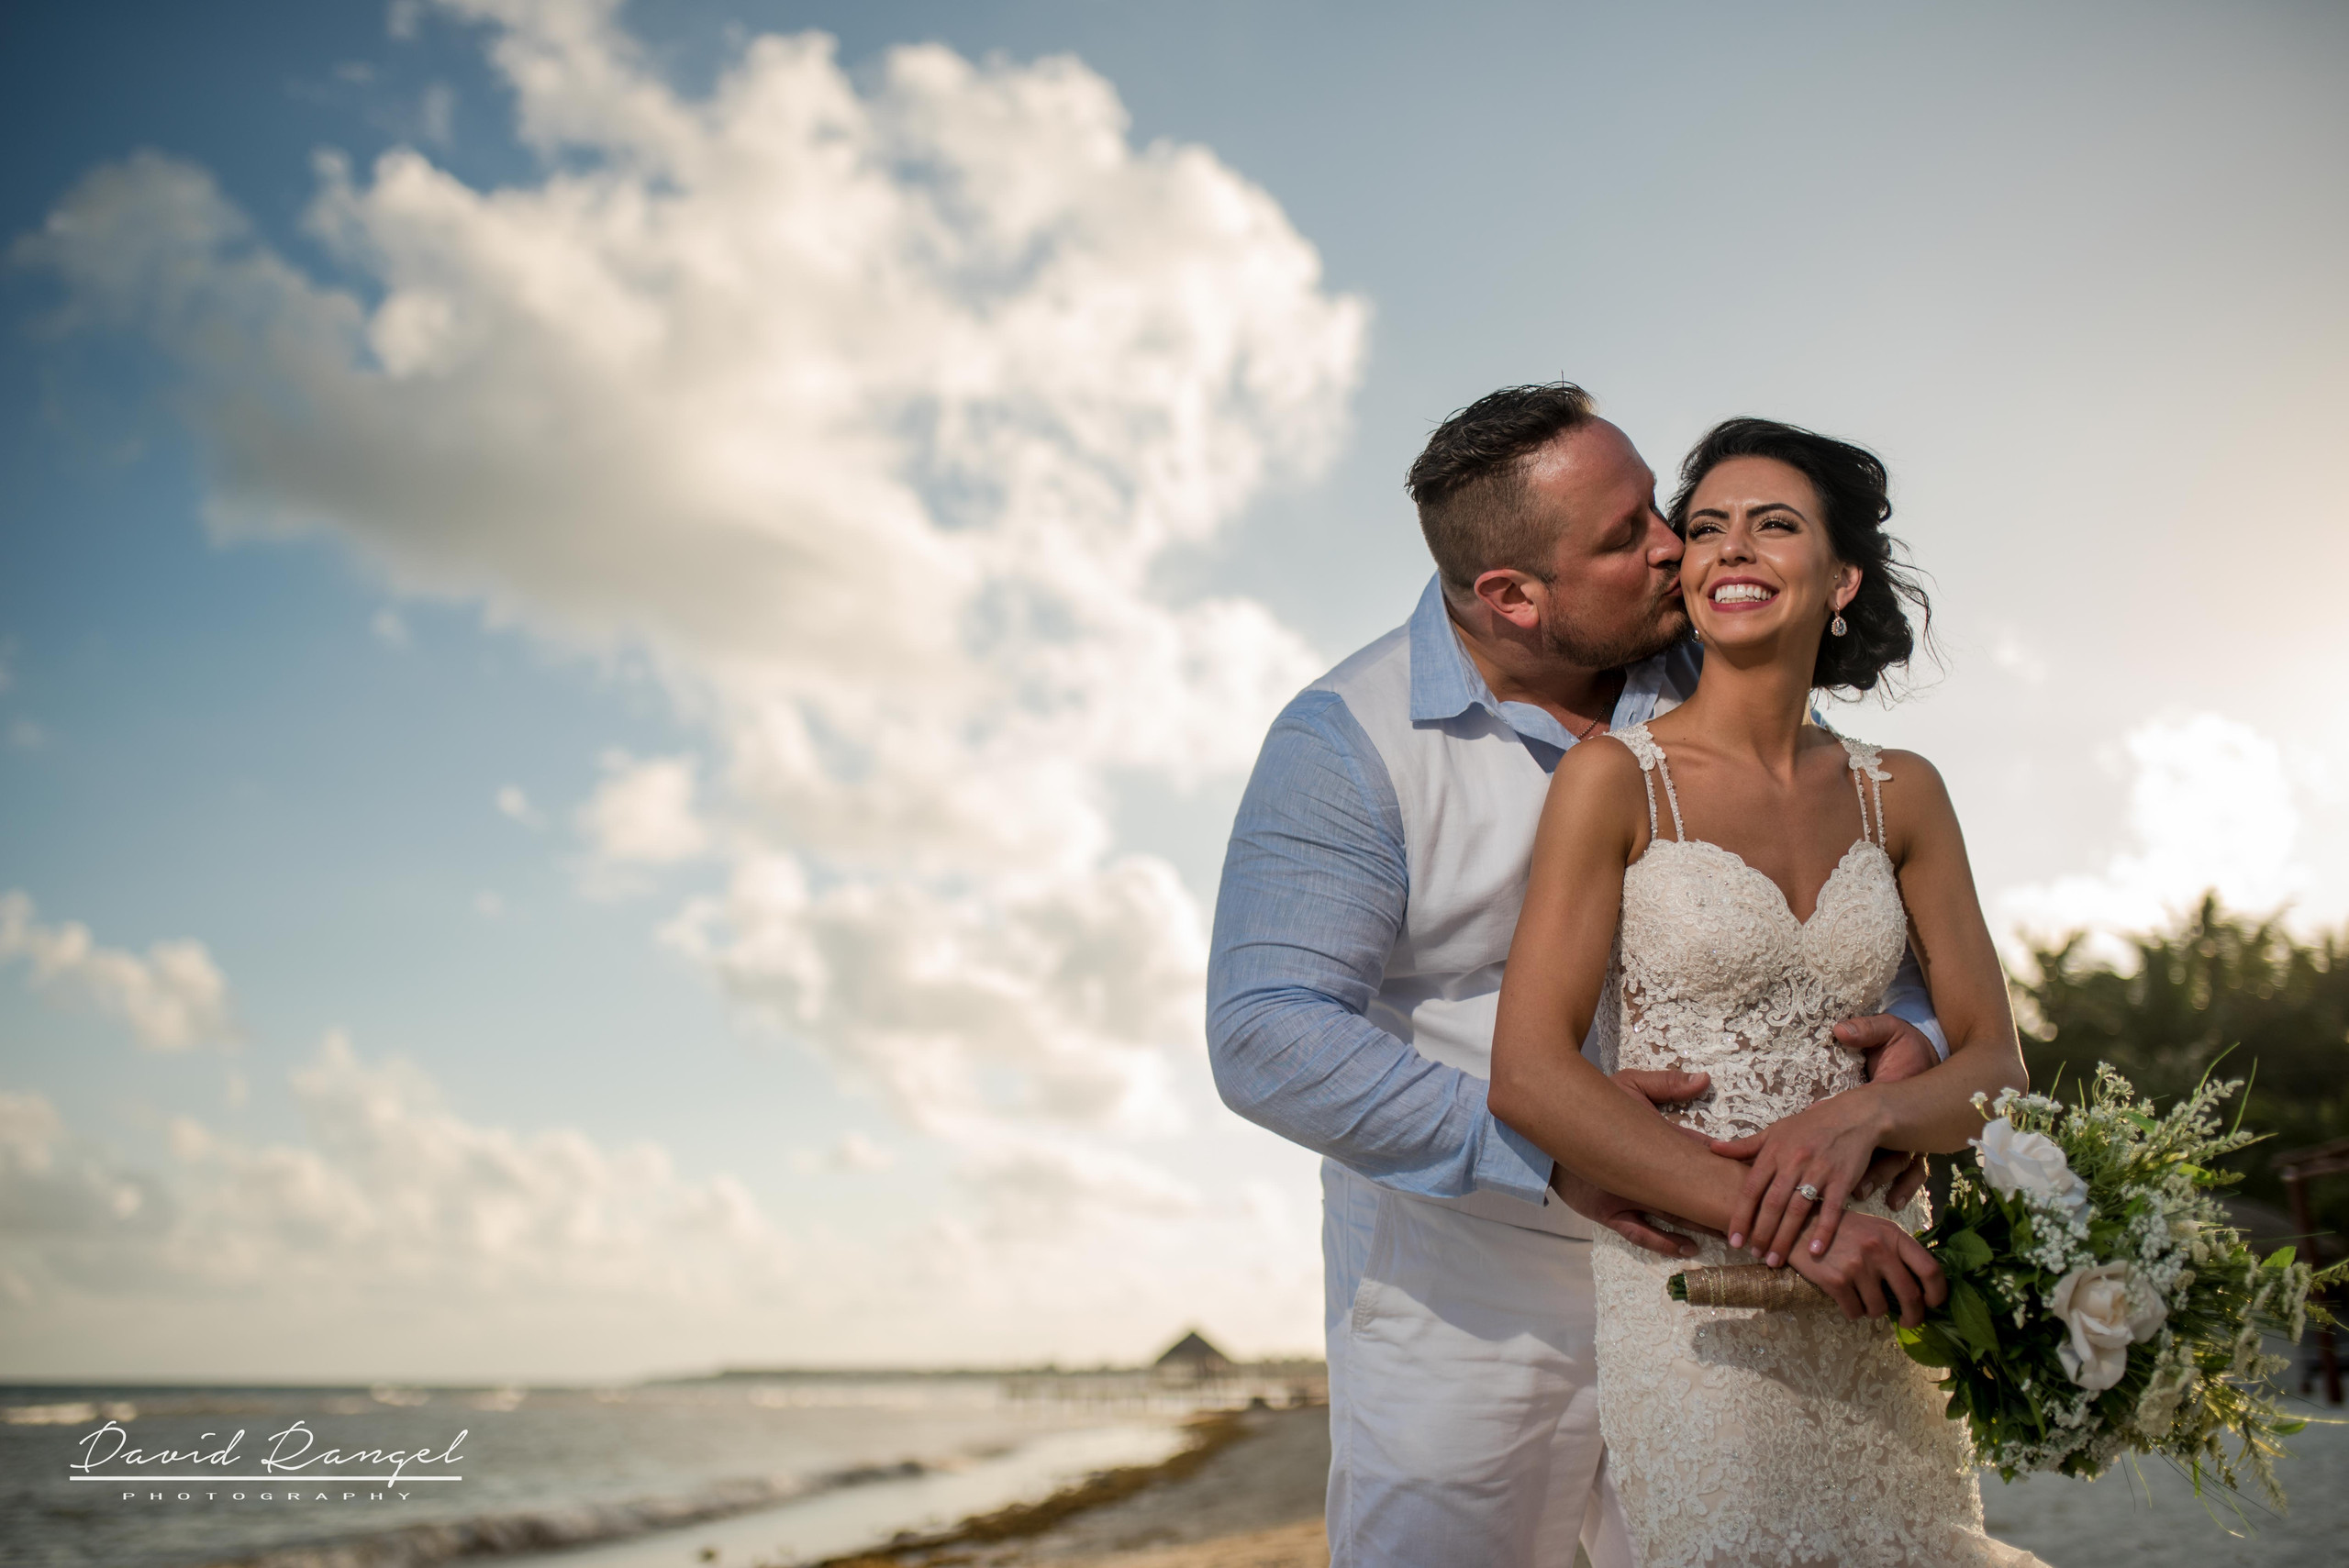 wedding+photo+bride+groom+bouquet+session+happy